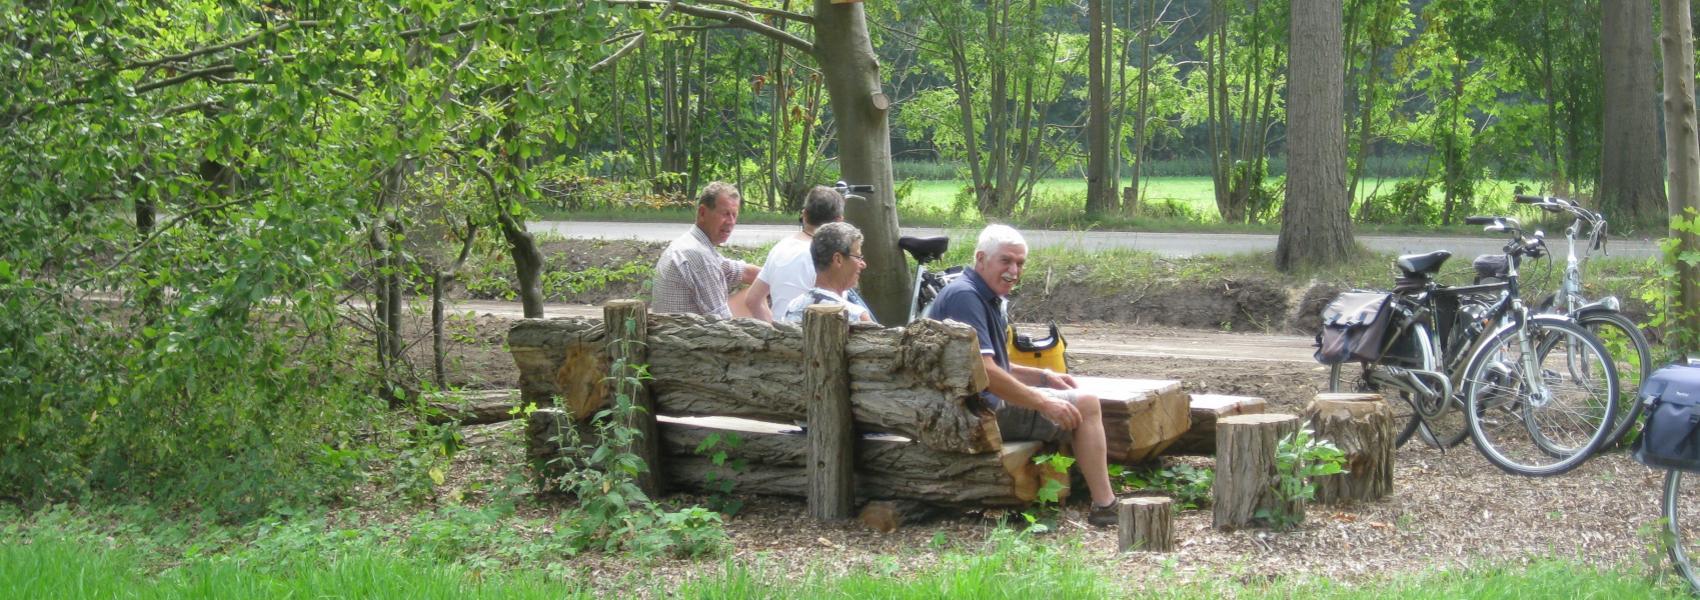 picknicken in Gewestbossen Ravels